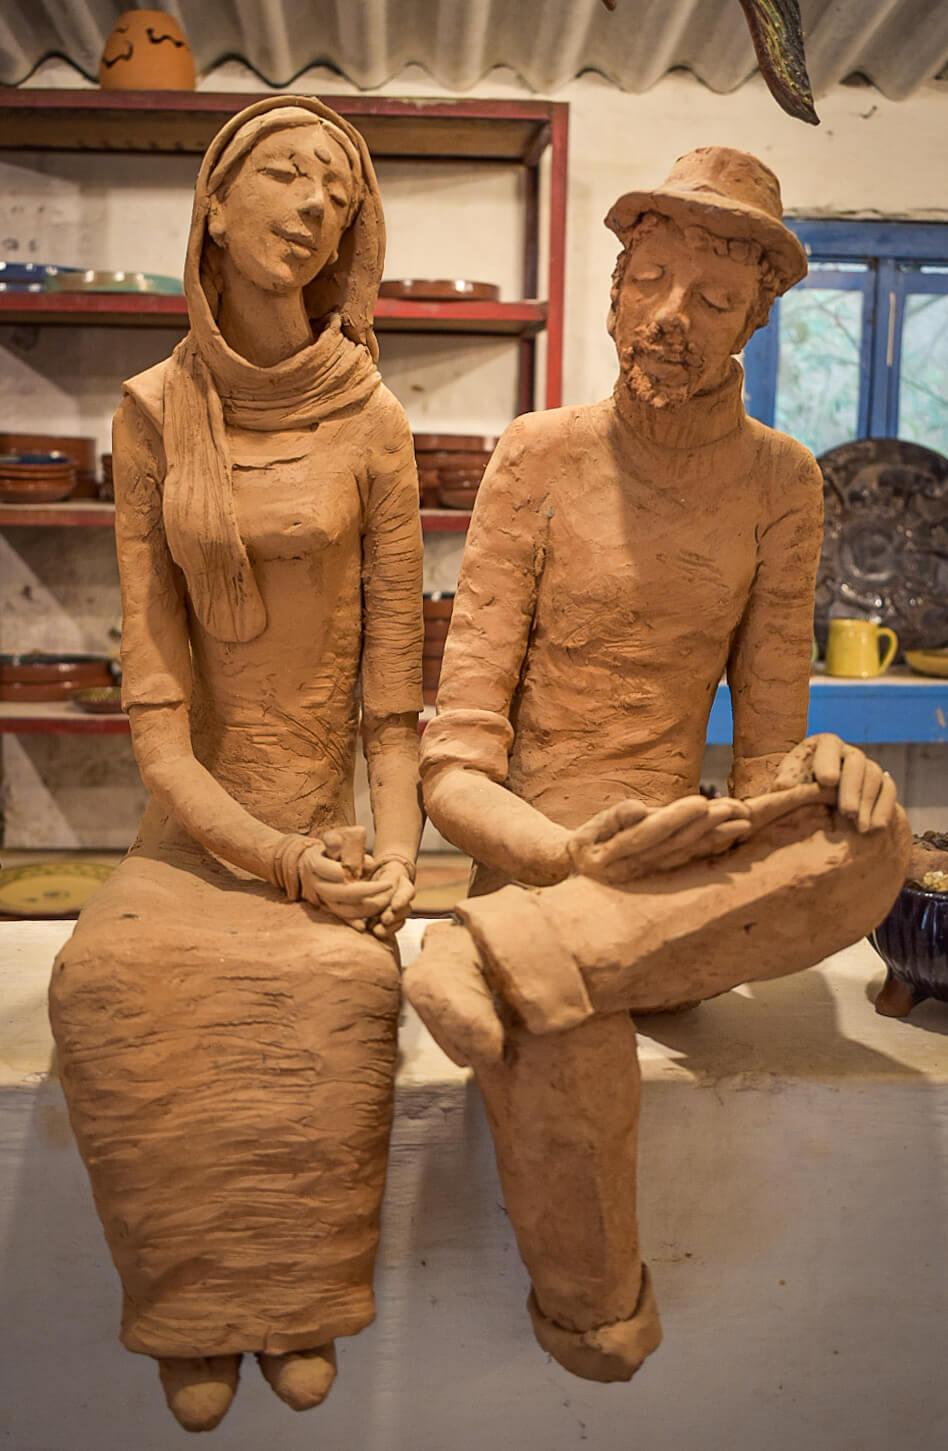 Handmade Art at the Pottery